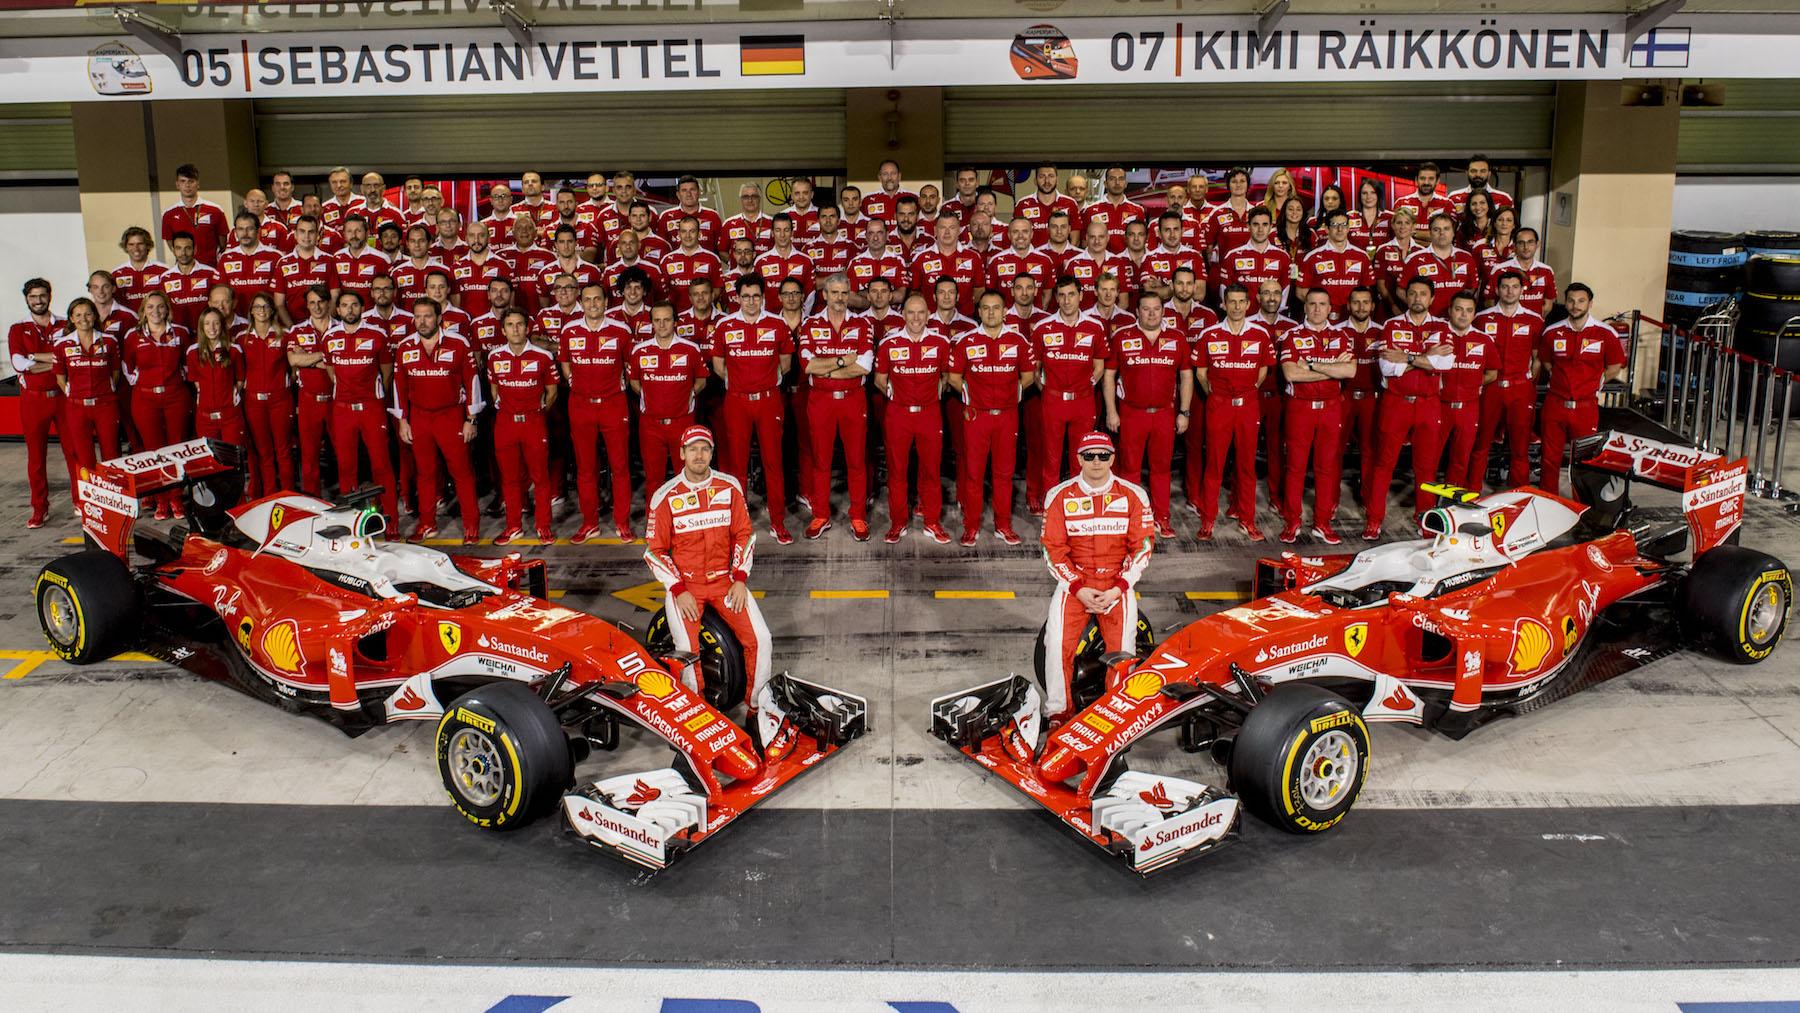 Salracing - Scuderia Ferrari family photo